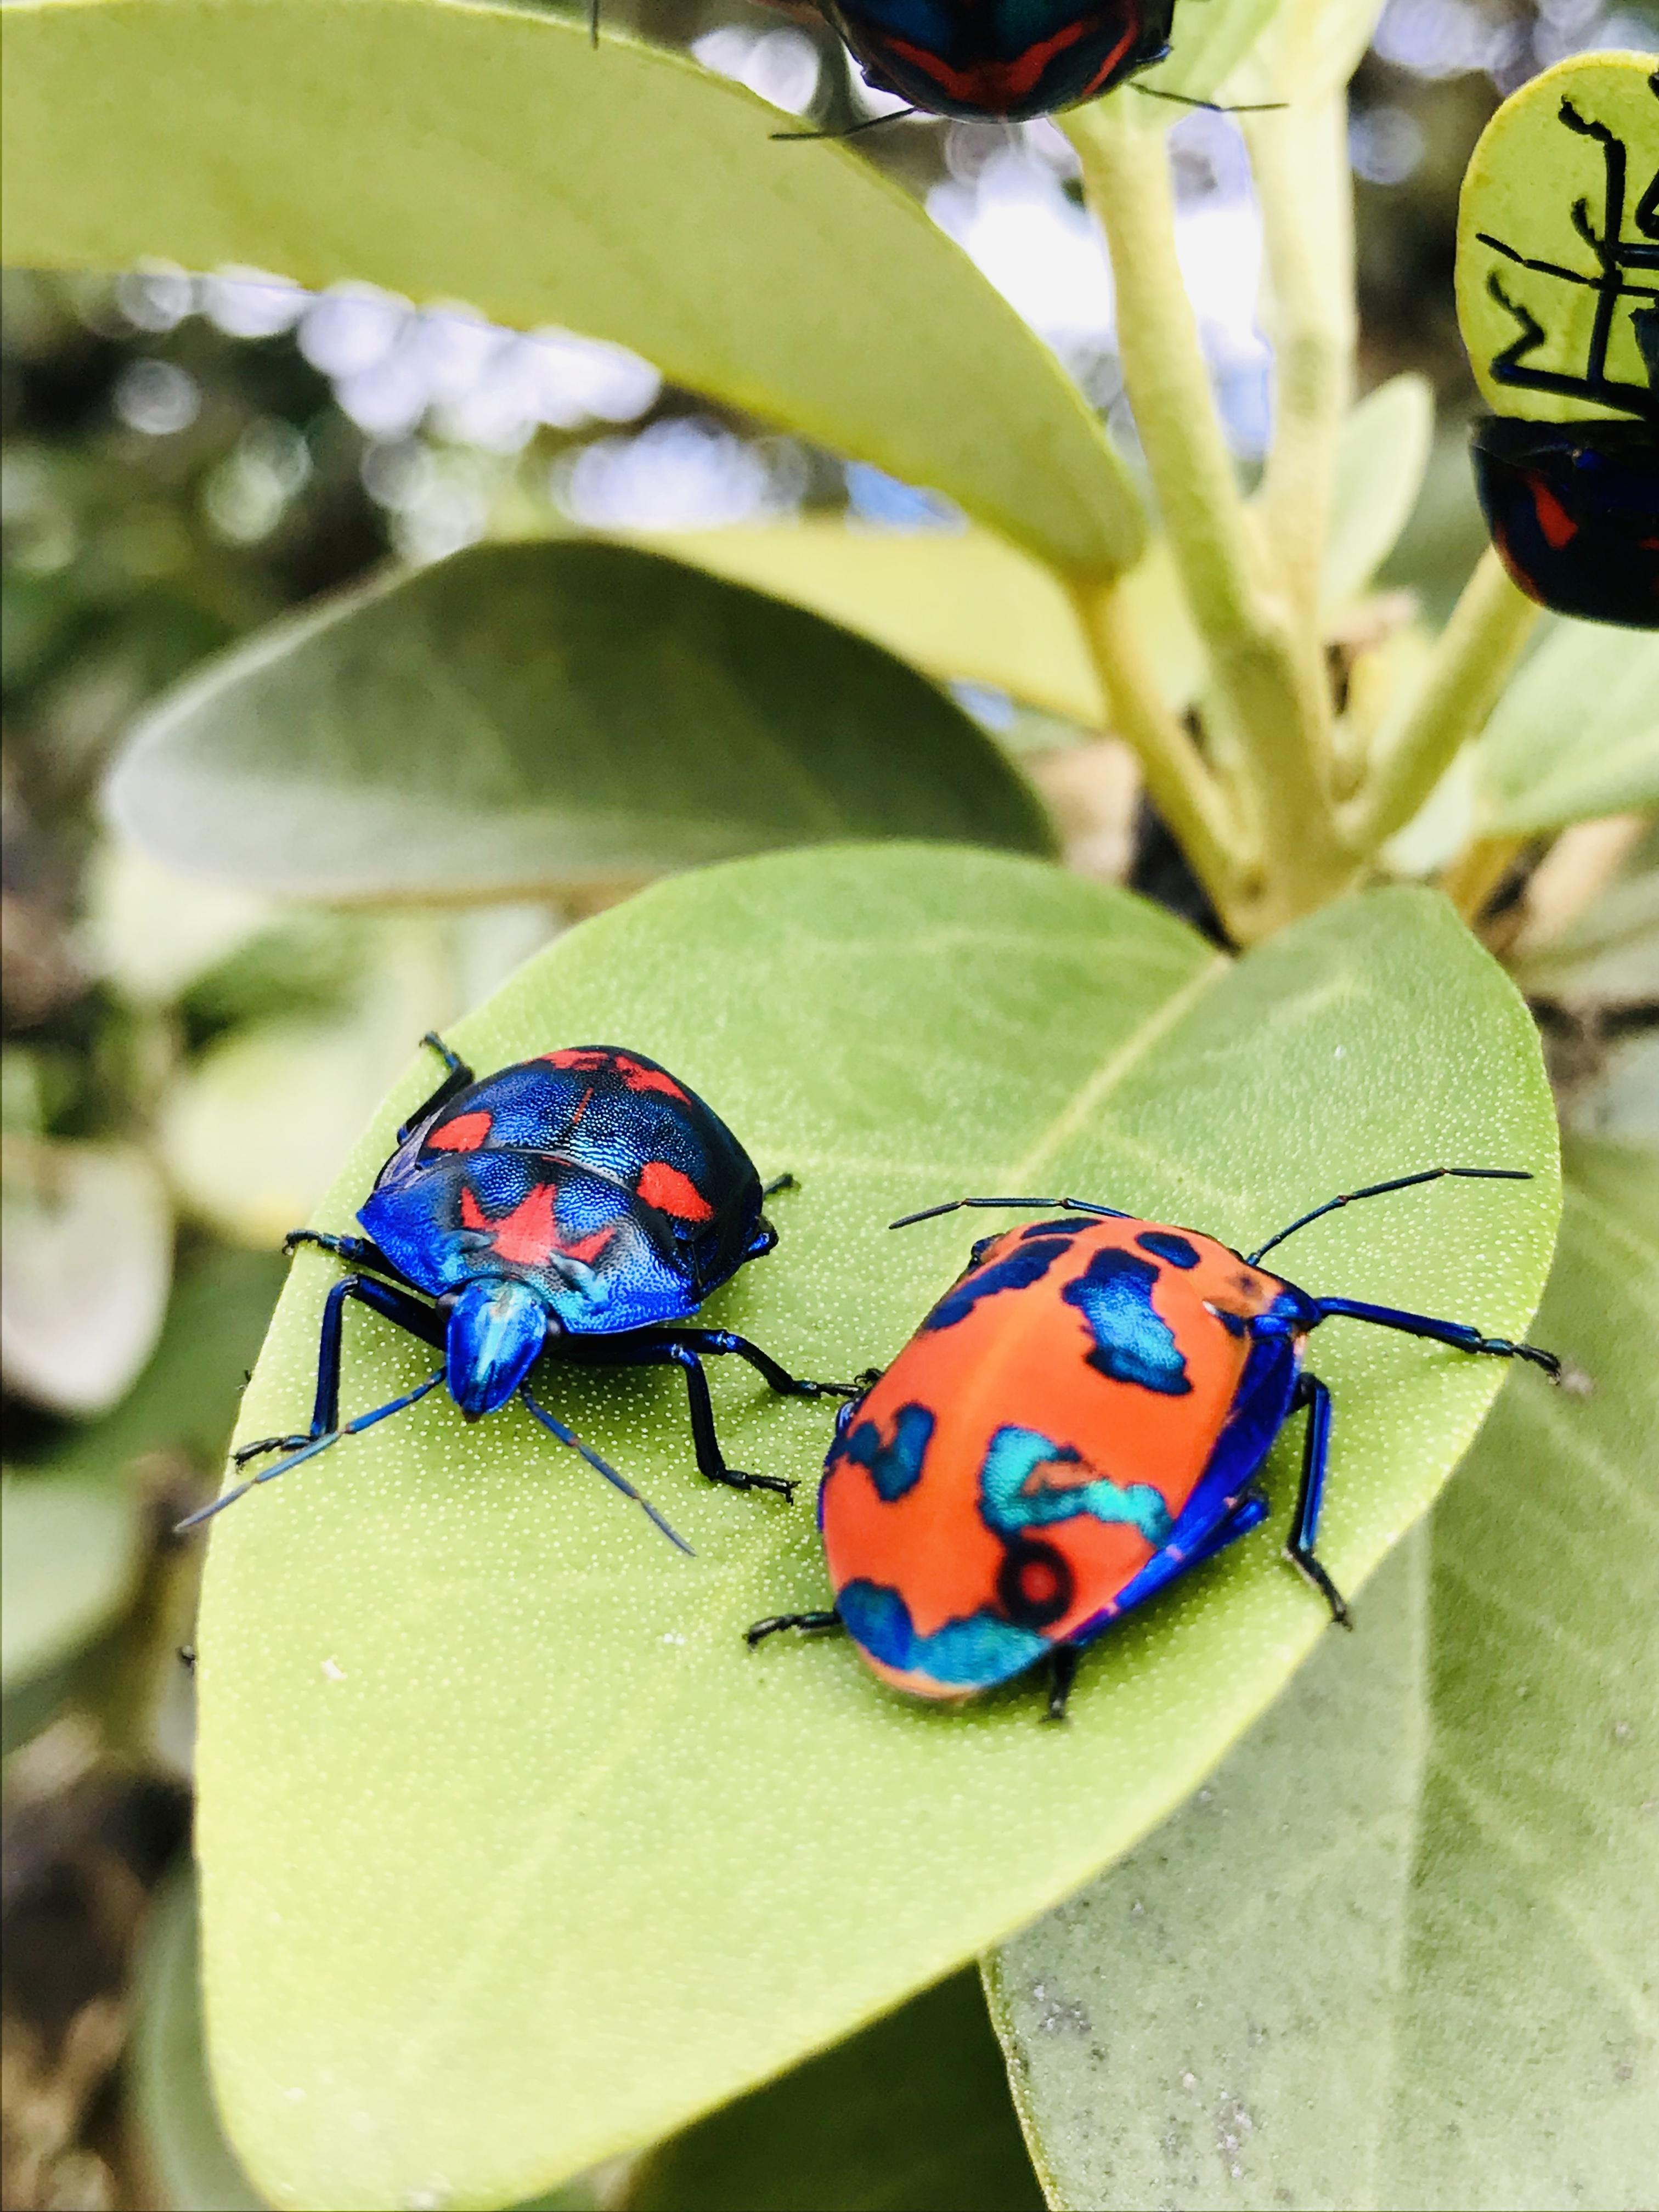 Tango Of The Hemipterans